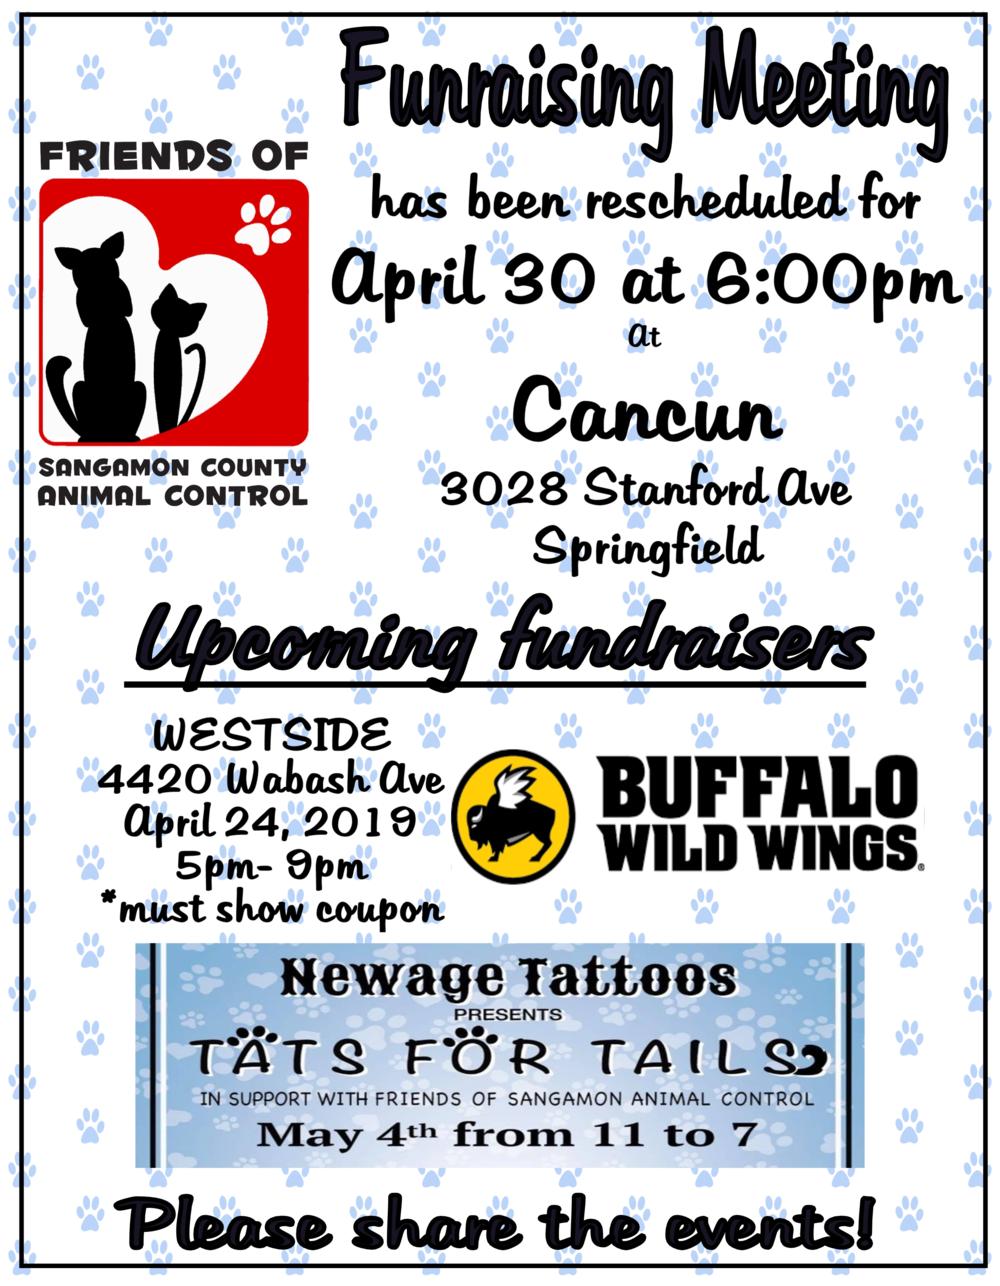 April 2019 Fundraiser Meeting Flyer.png